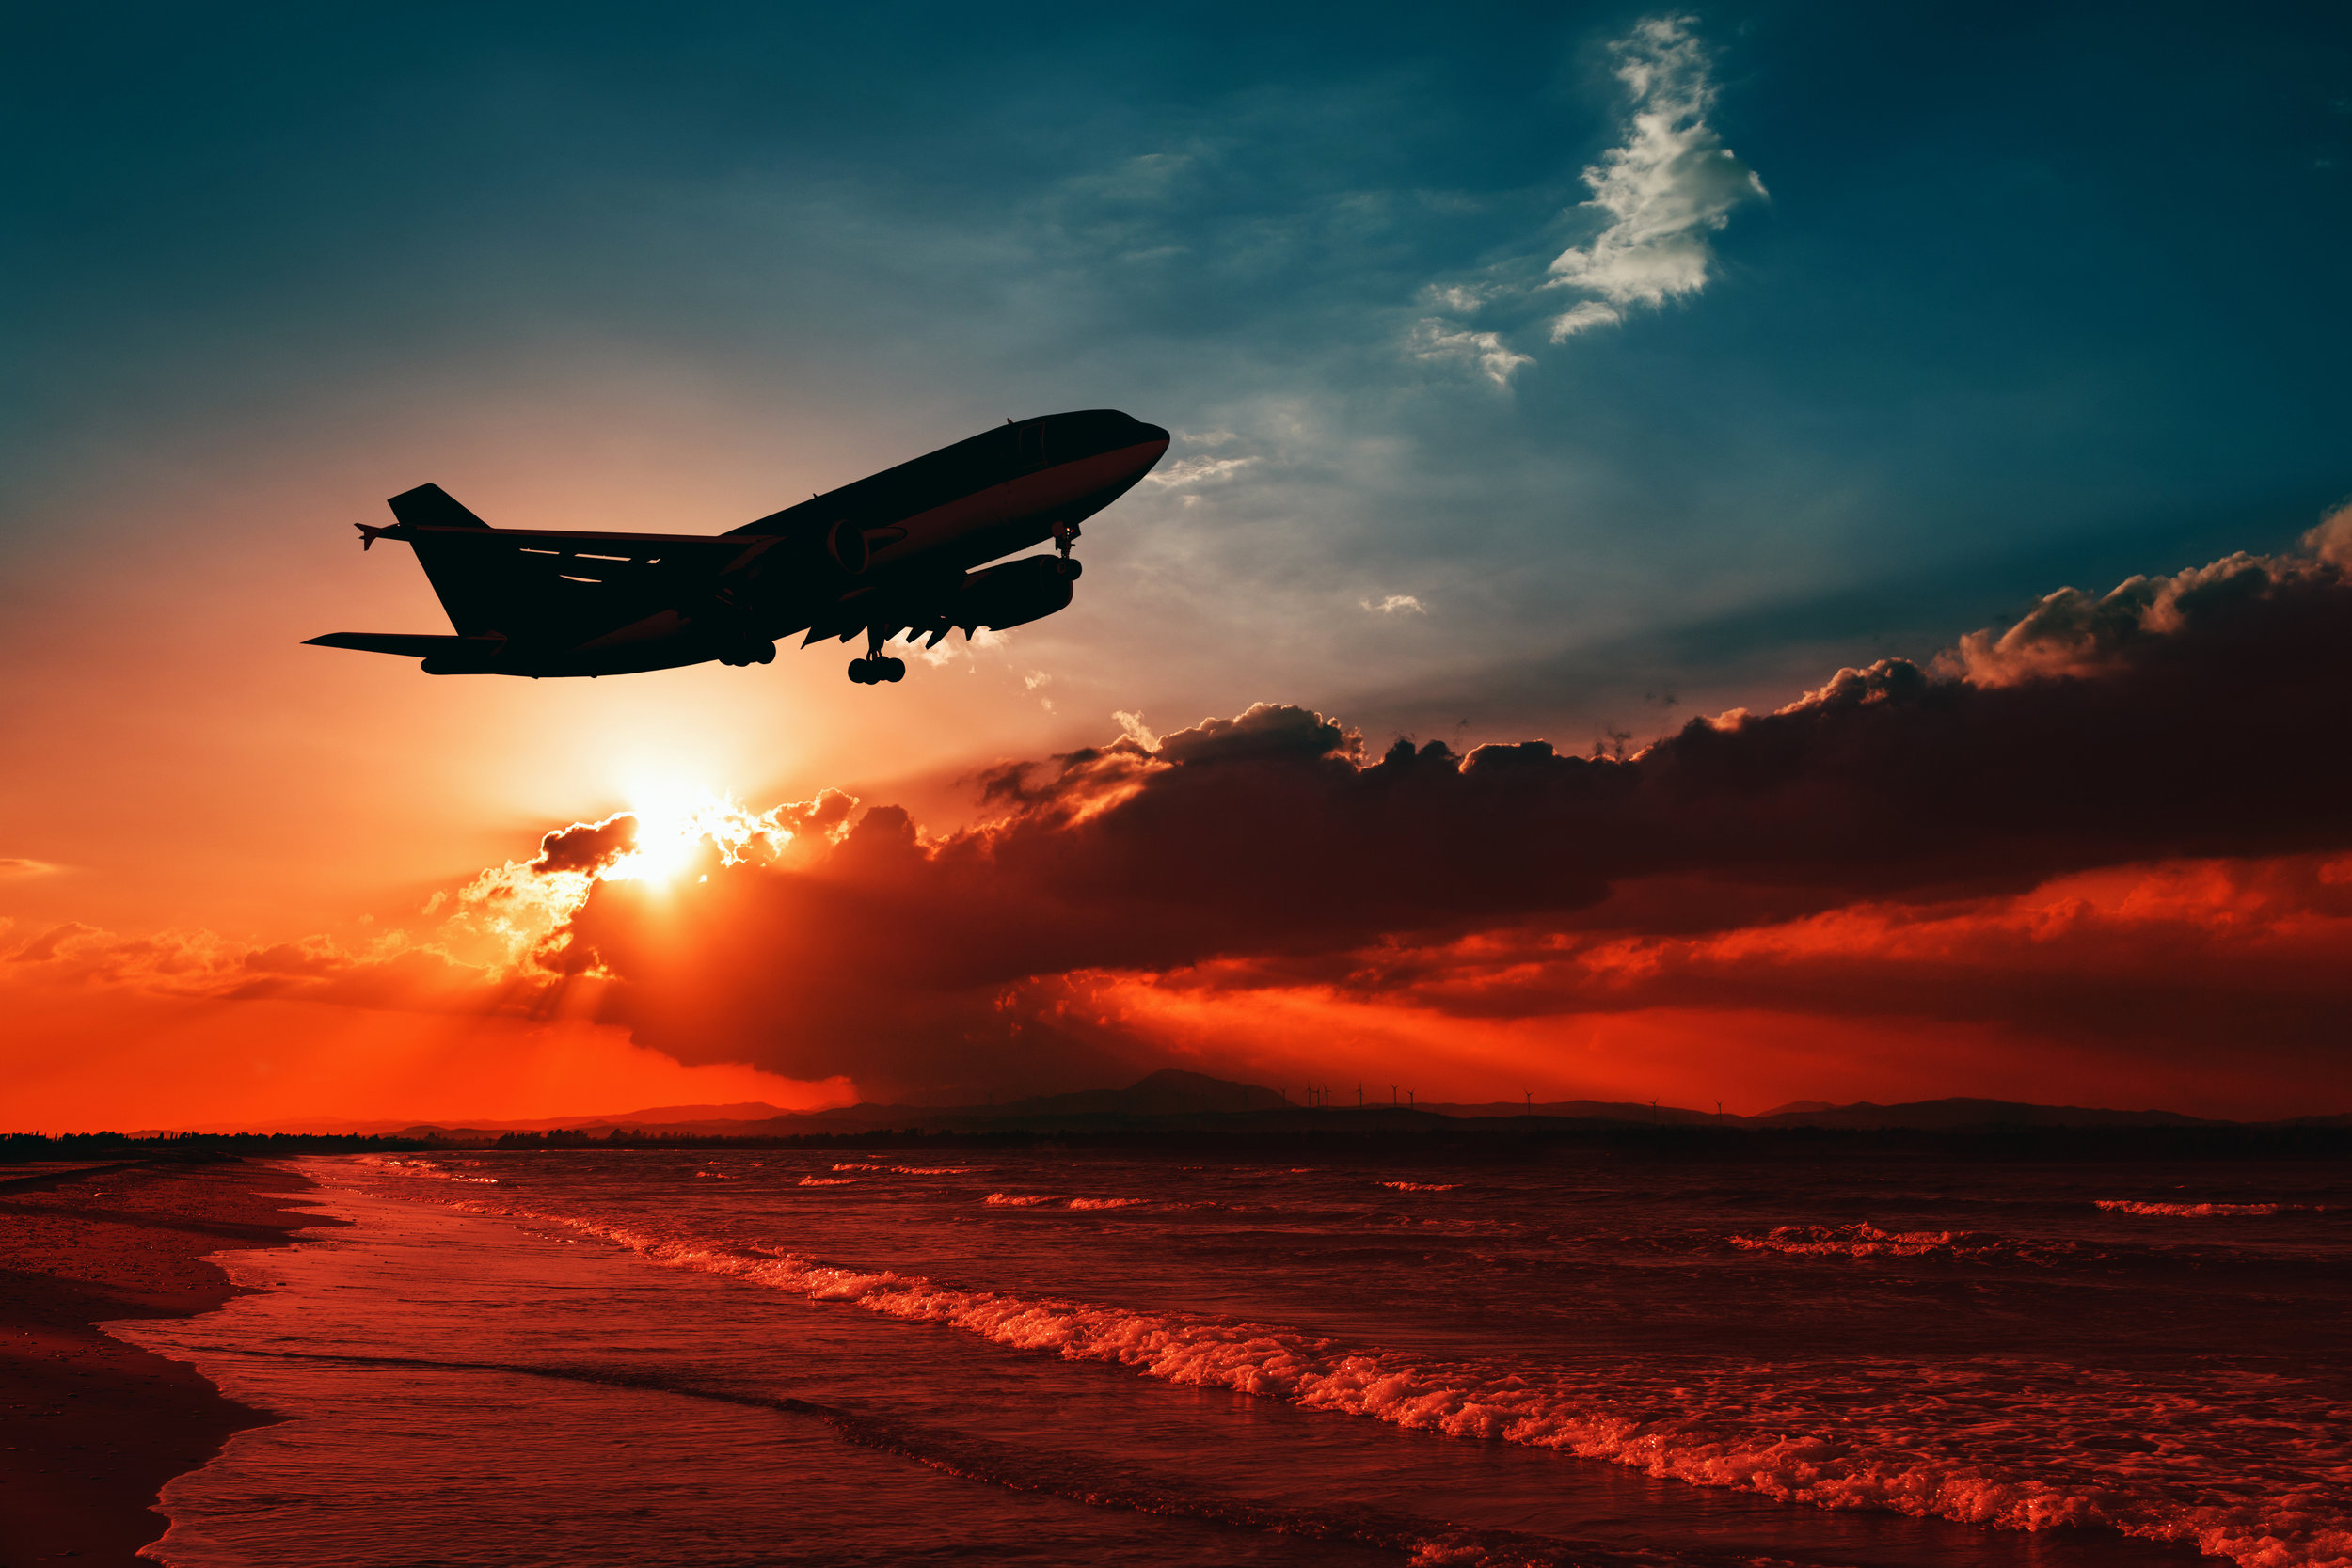 Airplane-at-sunset.jpg